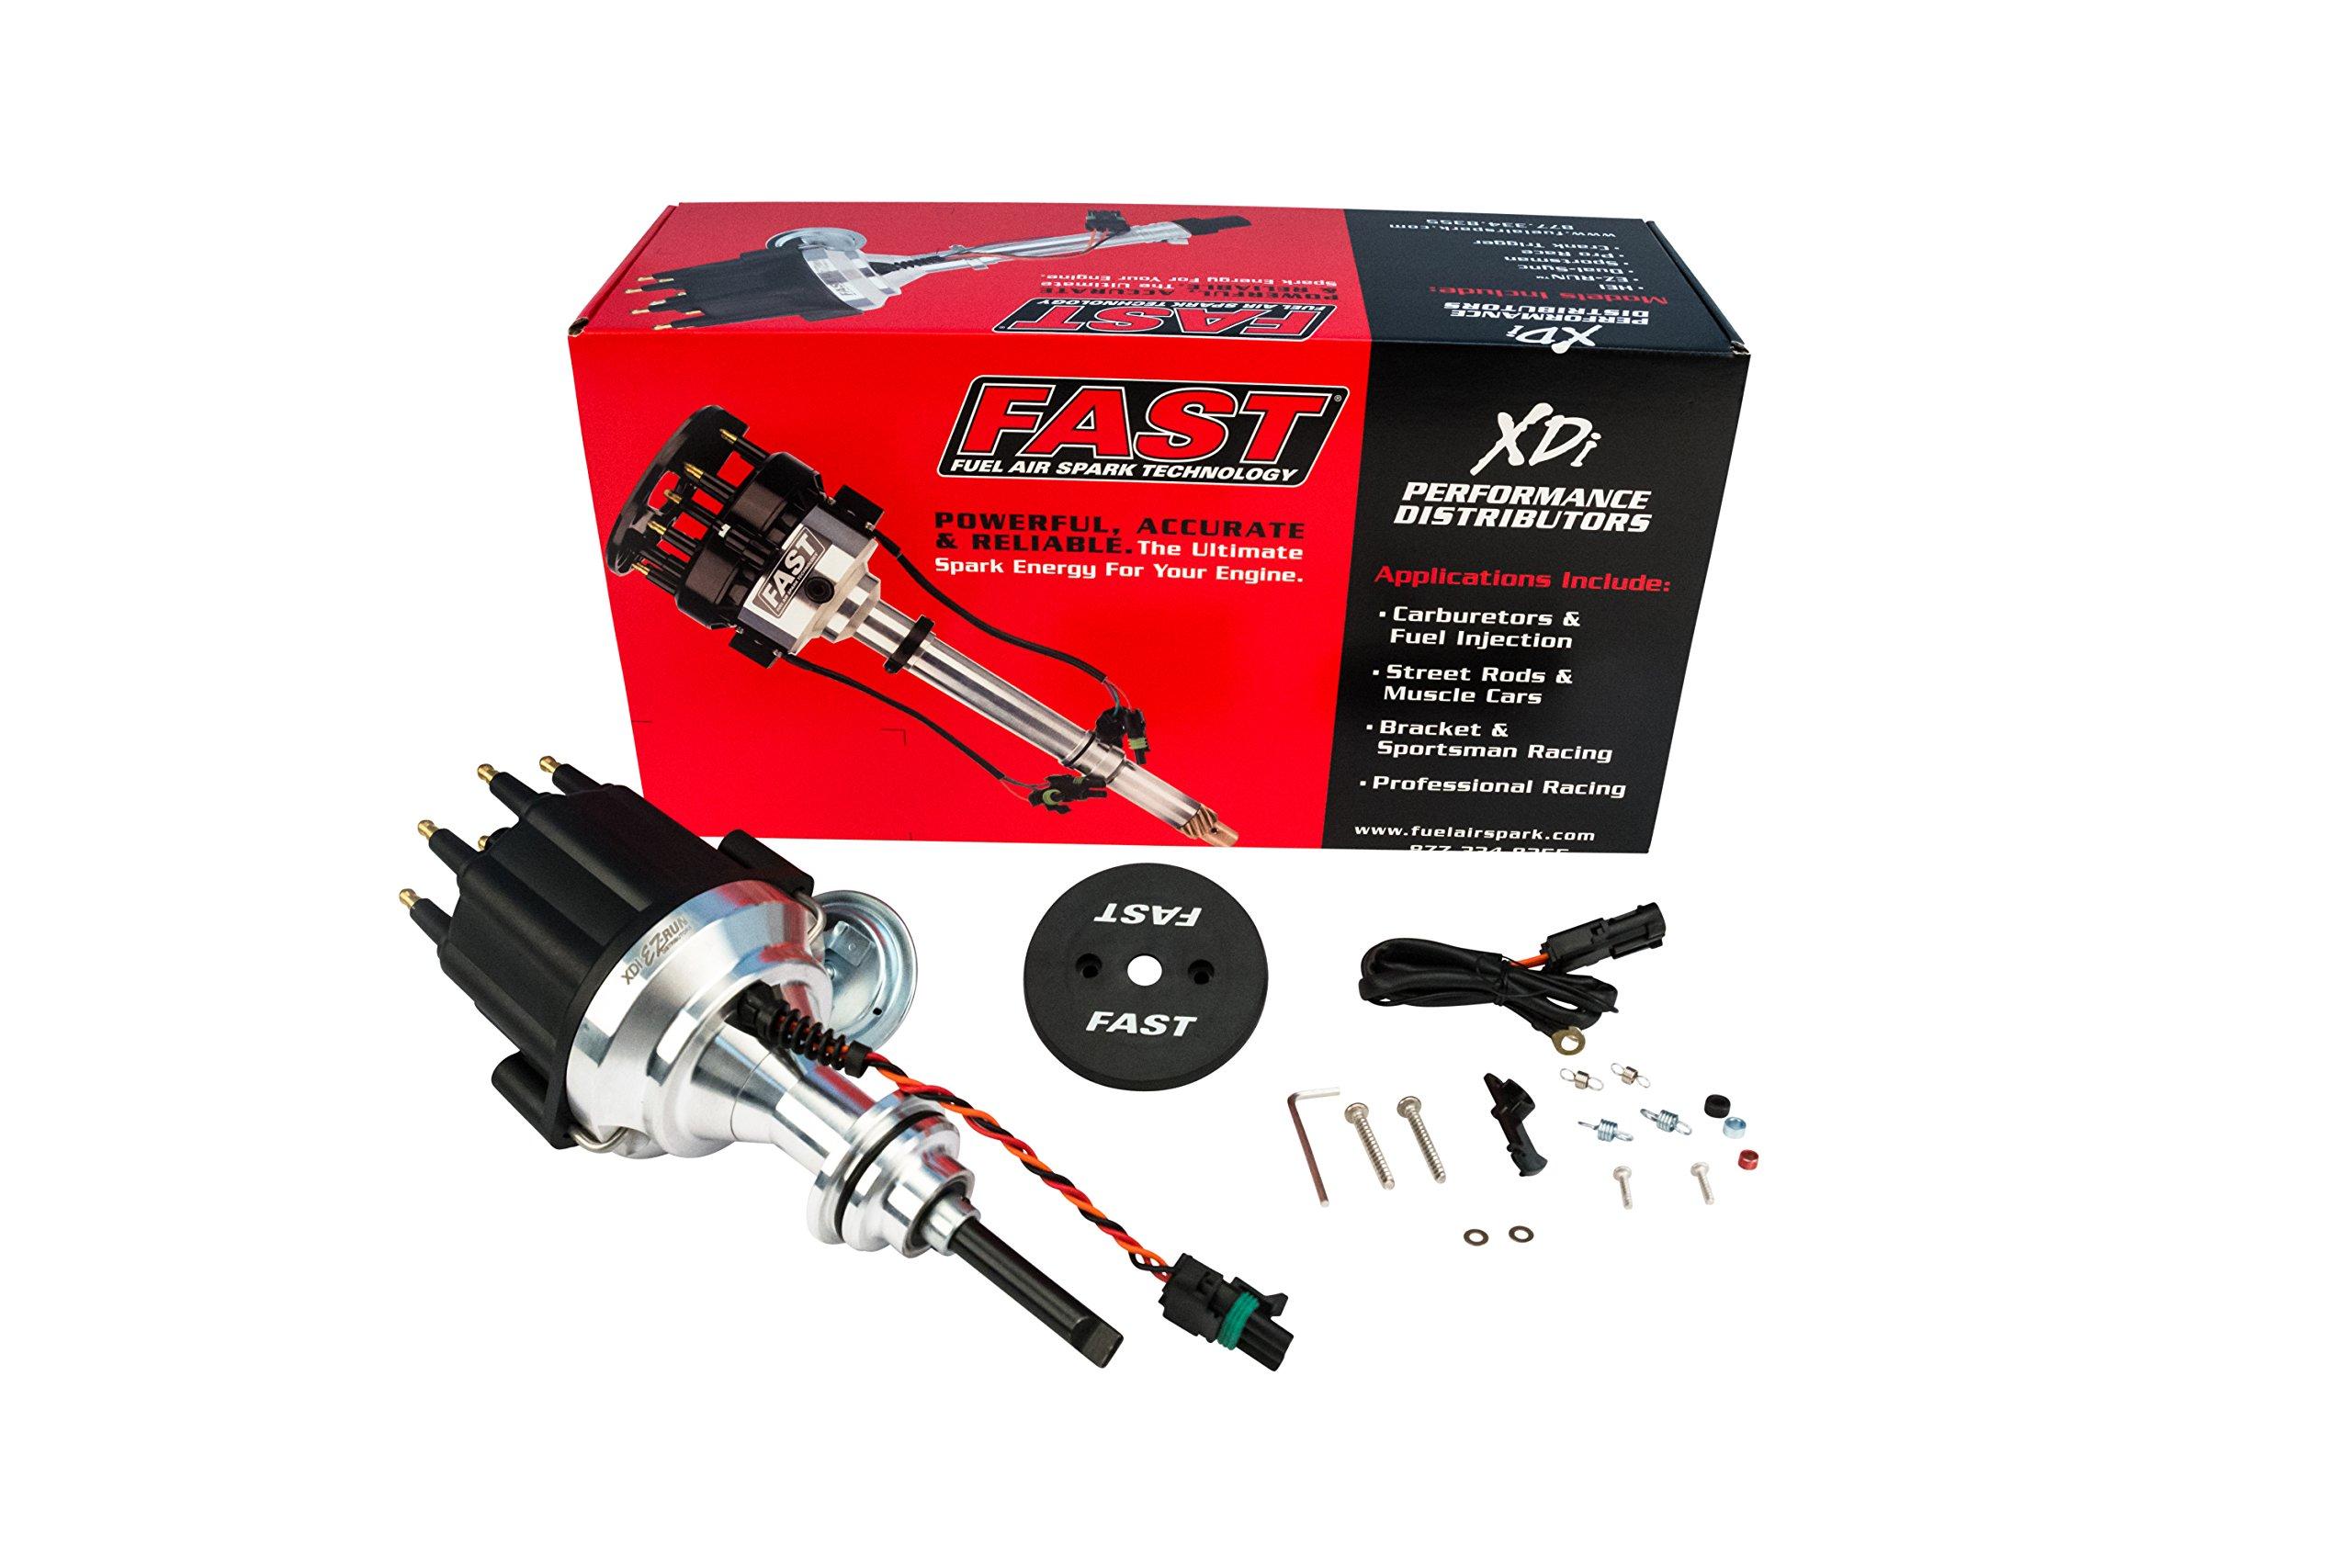 FAST 306011 XDI EZ-Run DistributorSBM A 273-360 by FAST (Image #2)